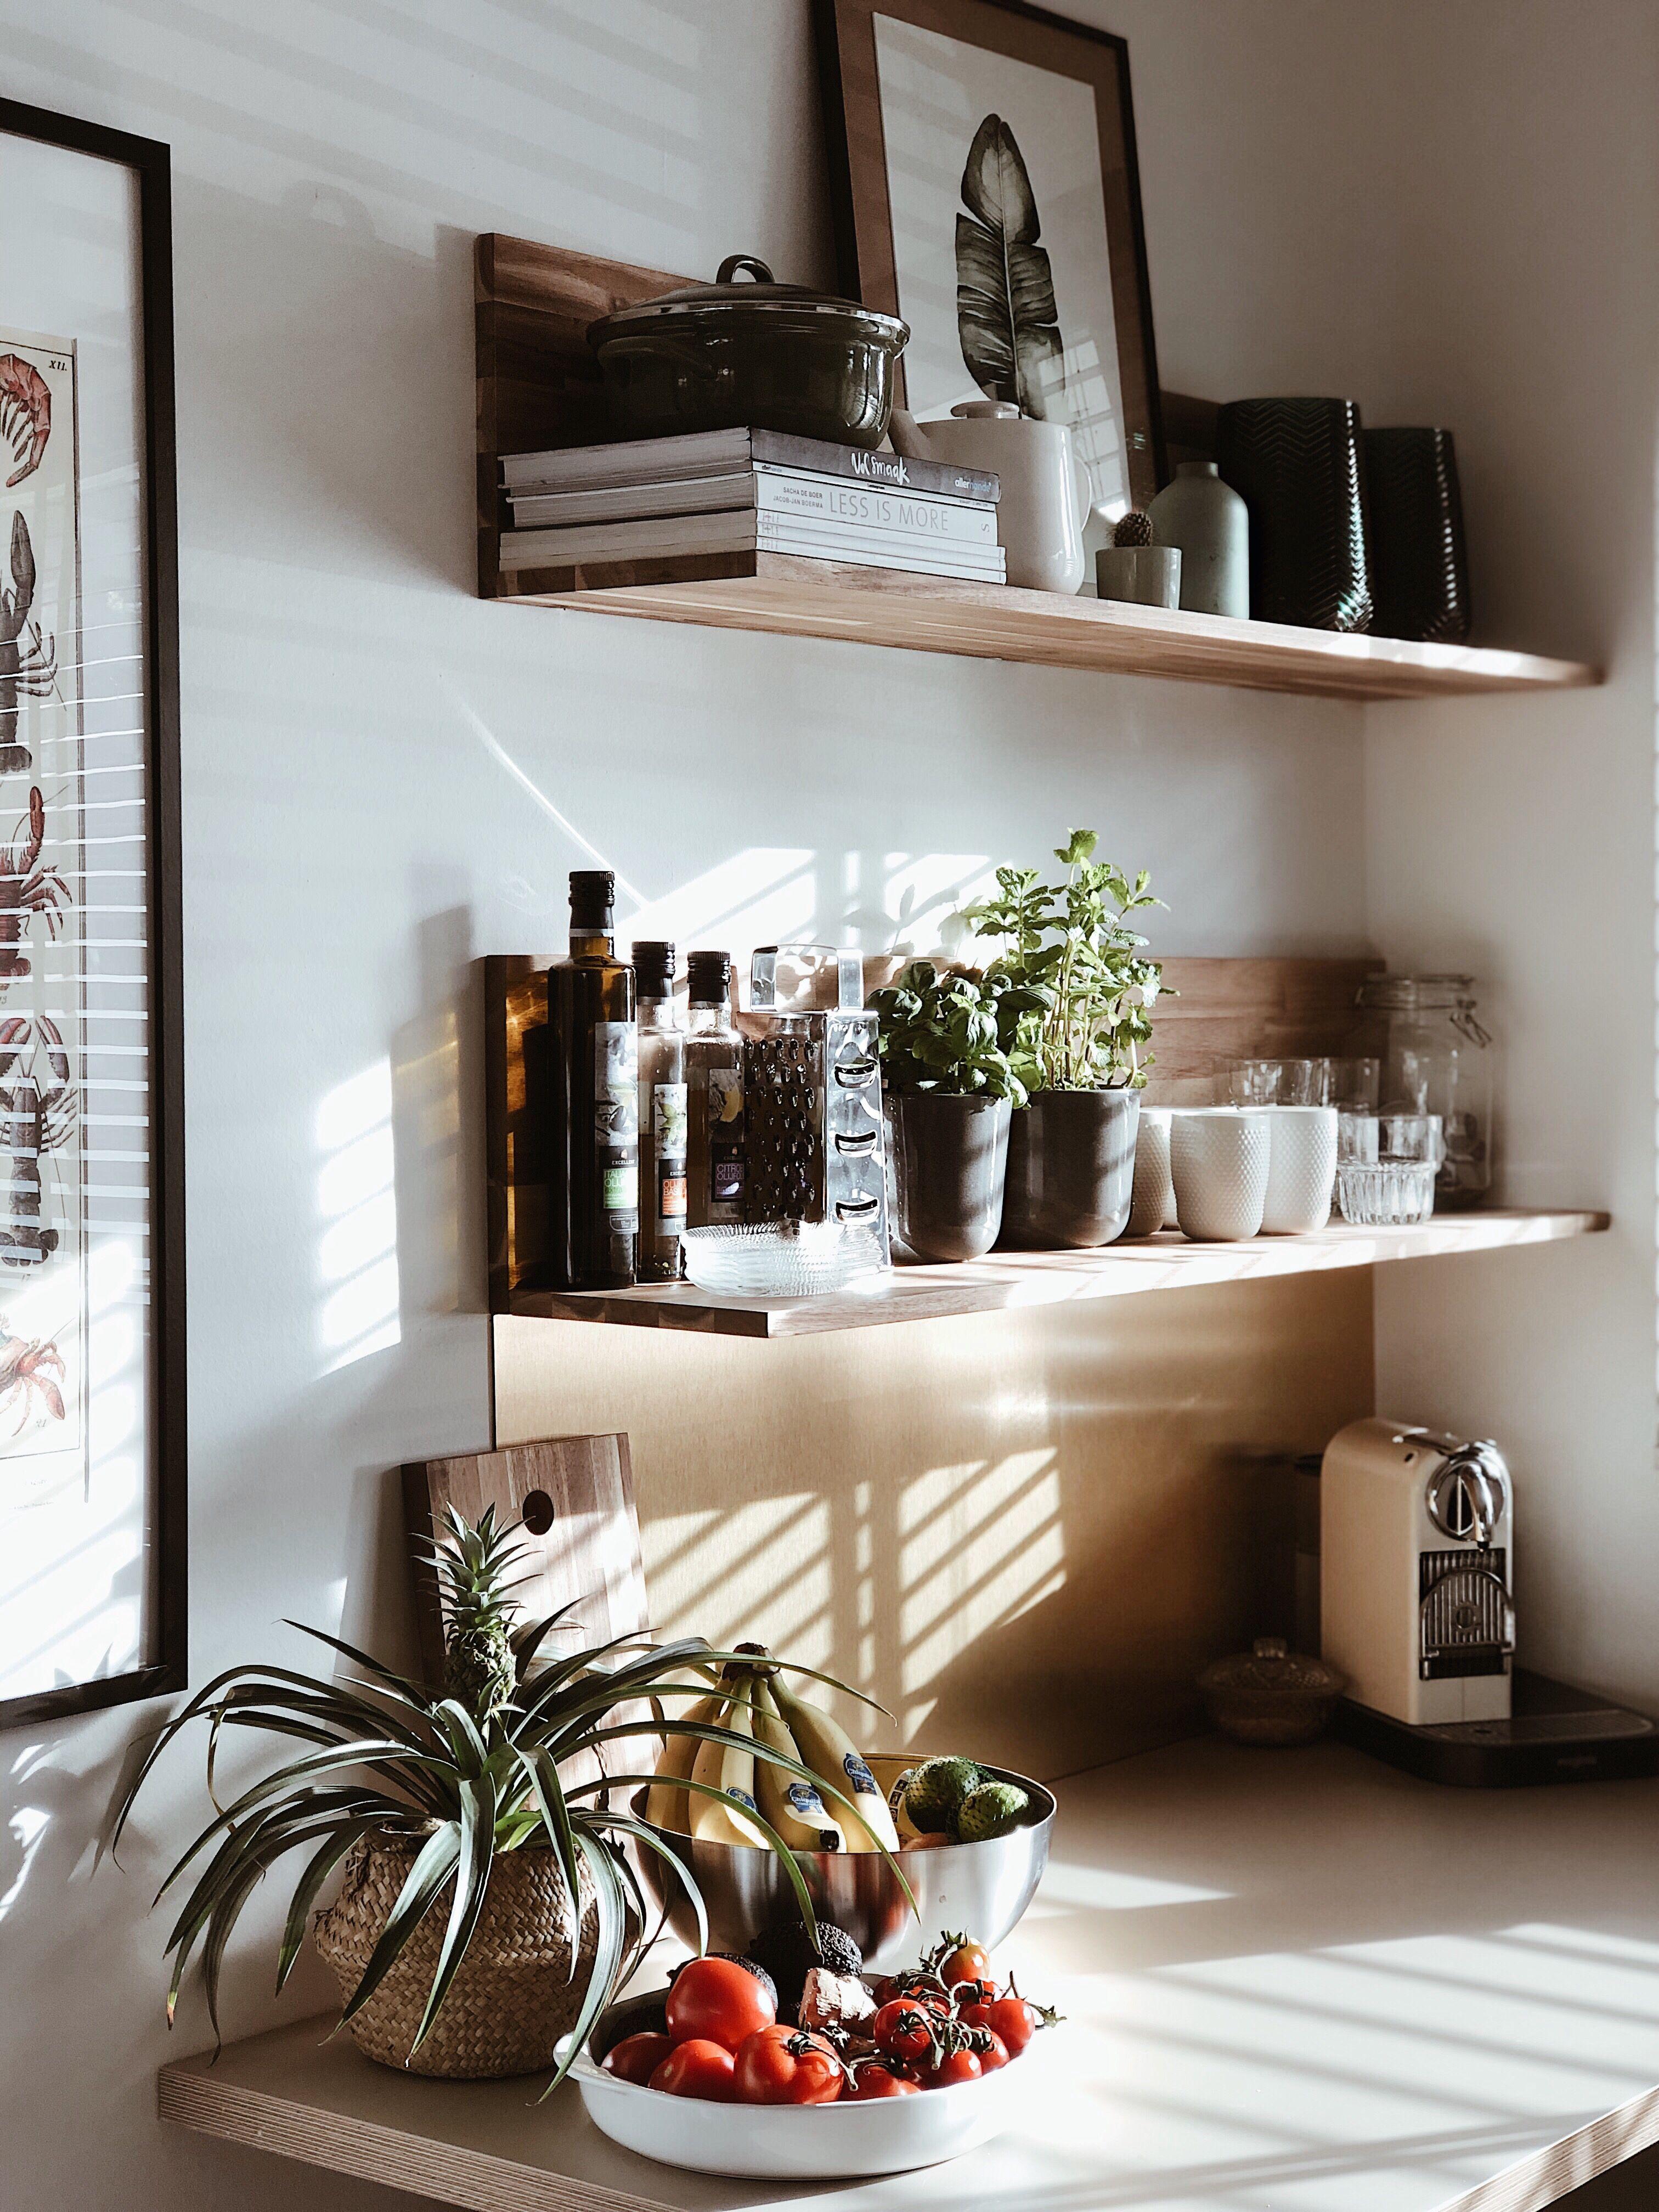 Keuken By Fleurblomstyling Keuken Decoratie Keuken Inspiratie Gouden Keuken